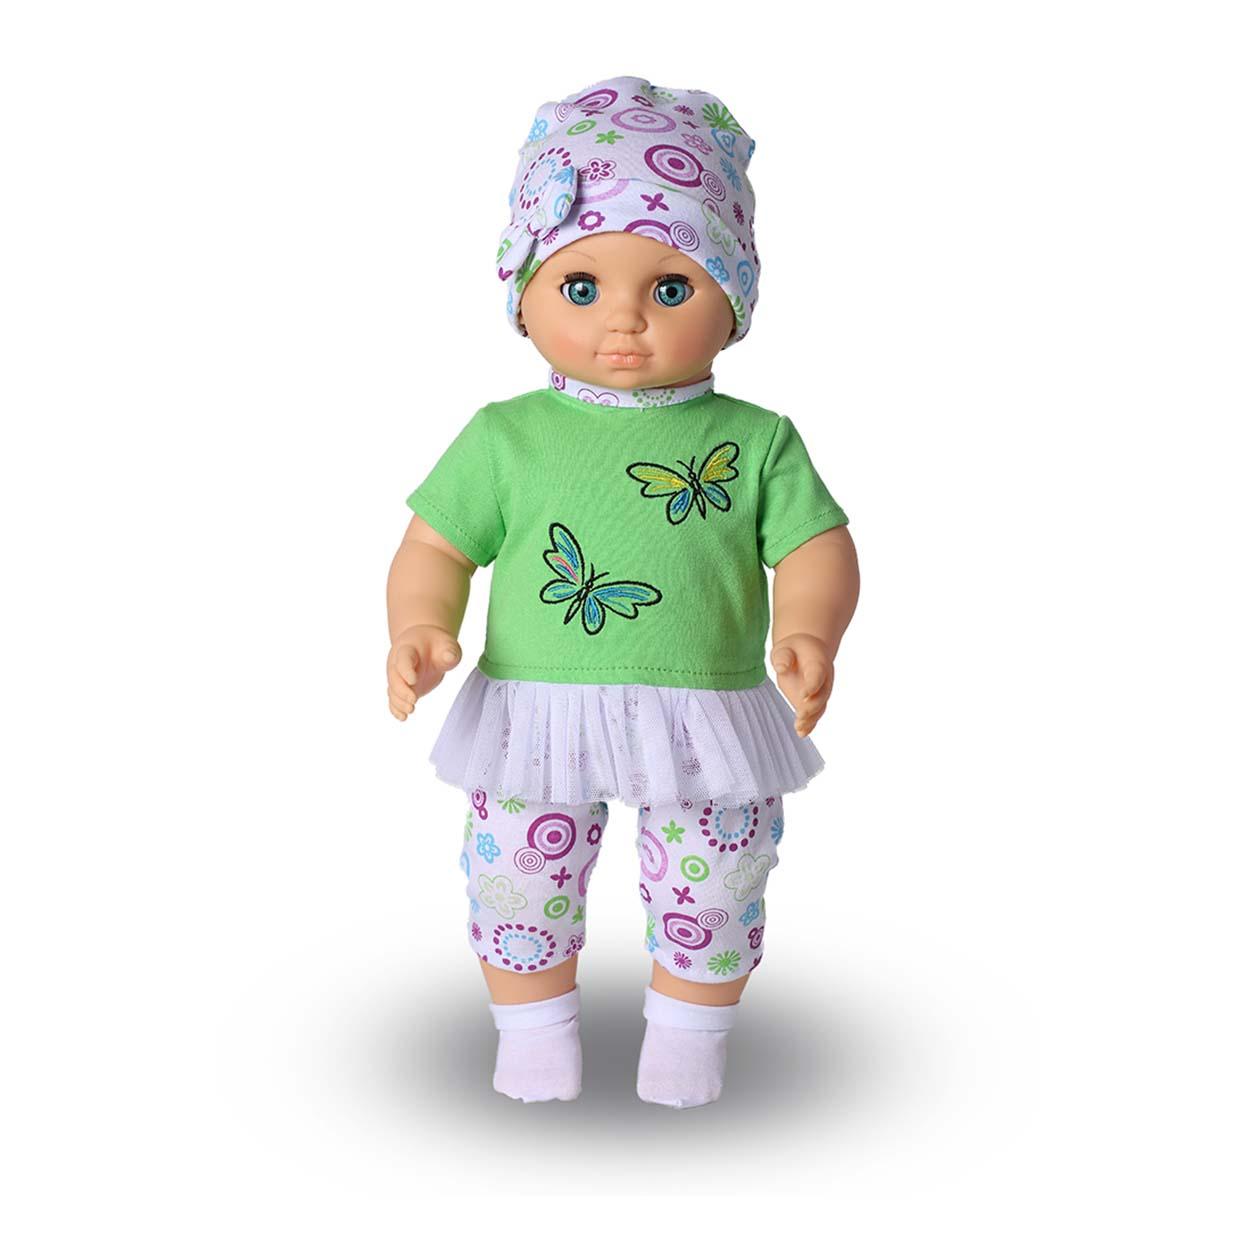 Кукла – Пупс 14, 42 смРусские куклы фабрики Весна<br>Кукла – Пупс 14, 42 см<br>